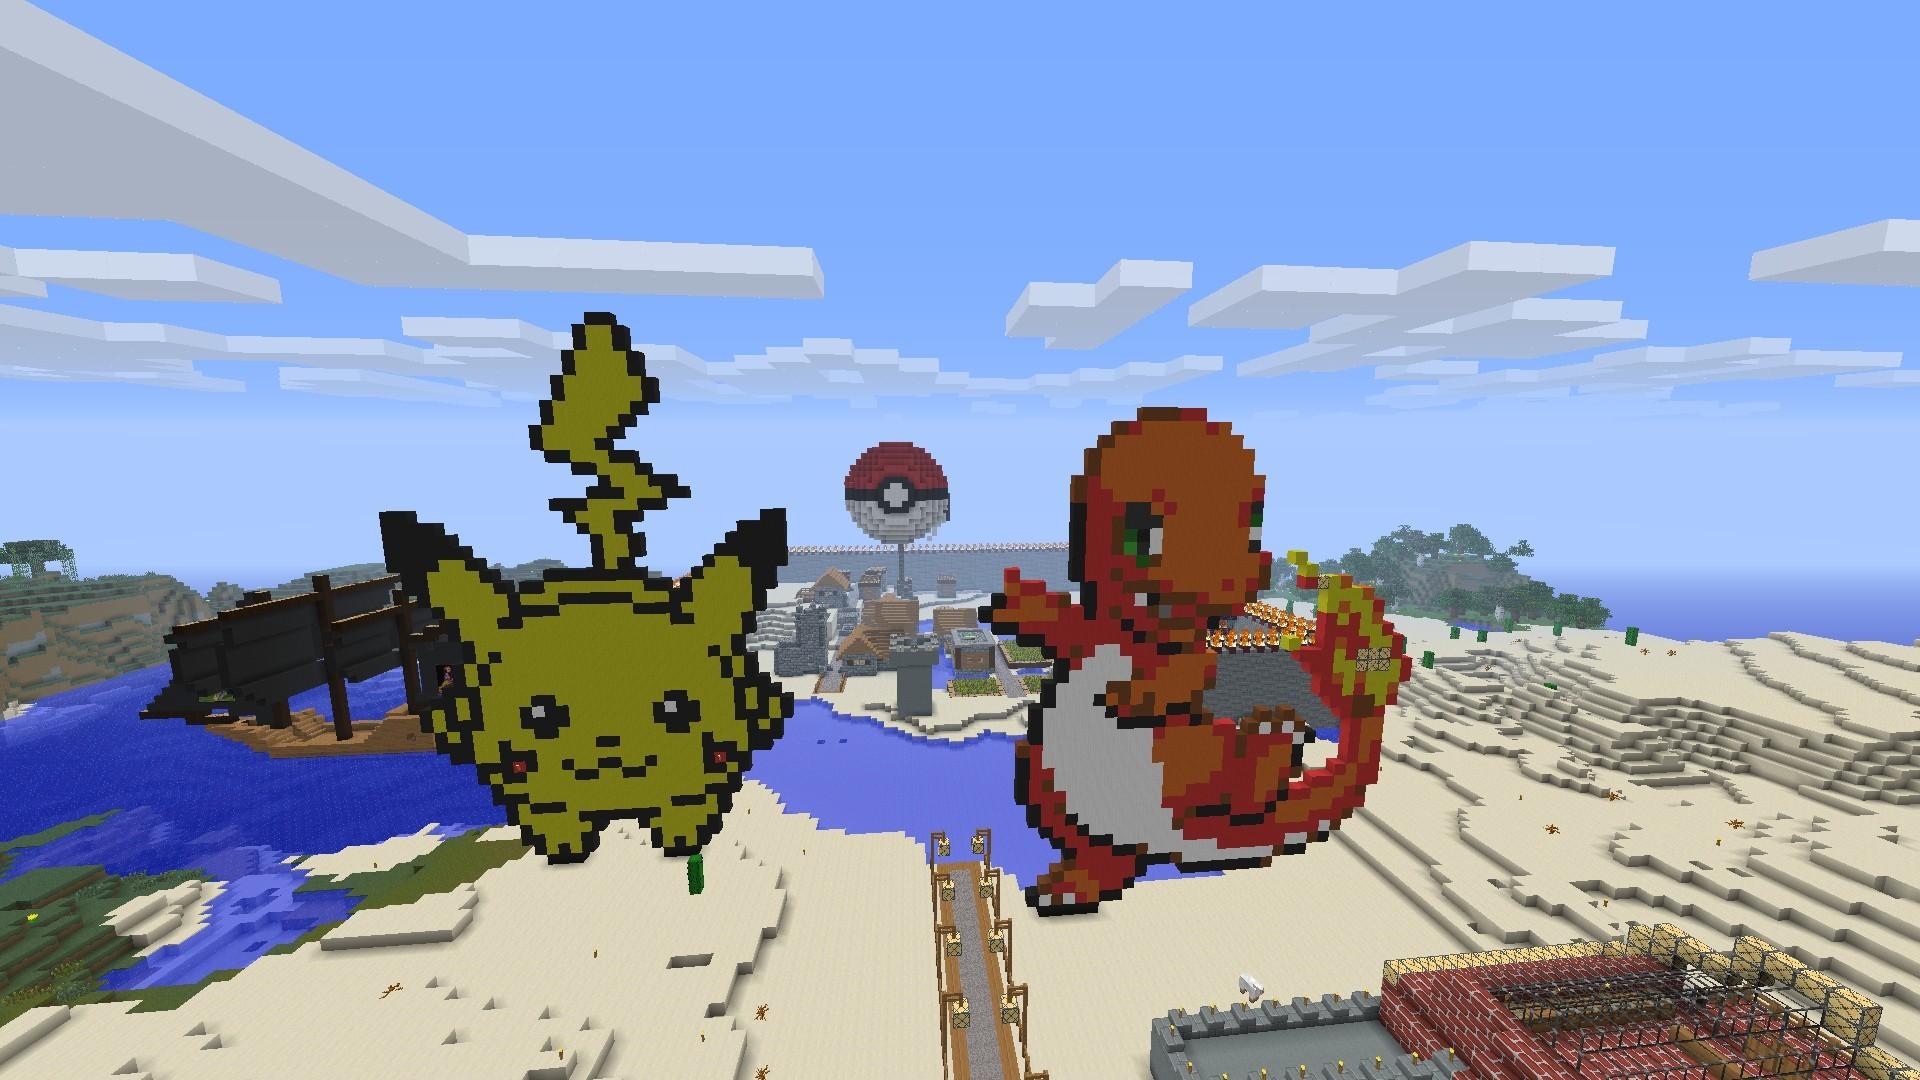 Minecraft Pokemon Art HD Wallpaper